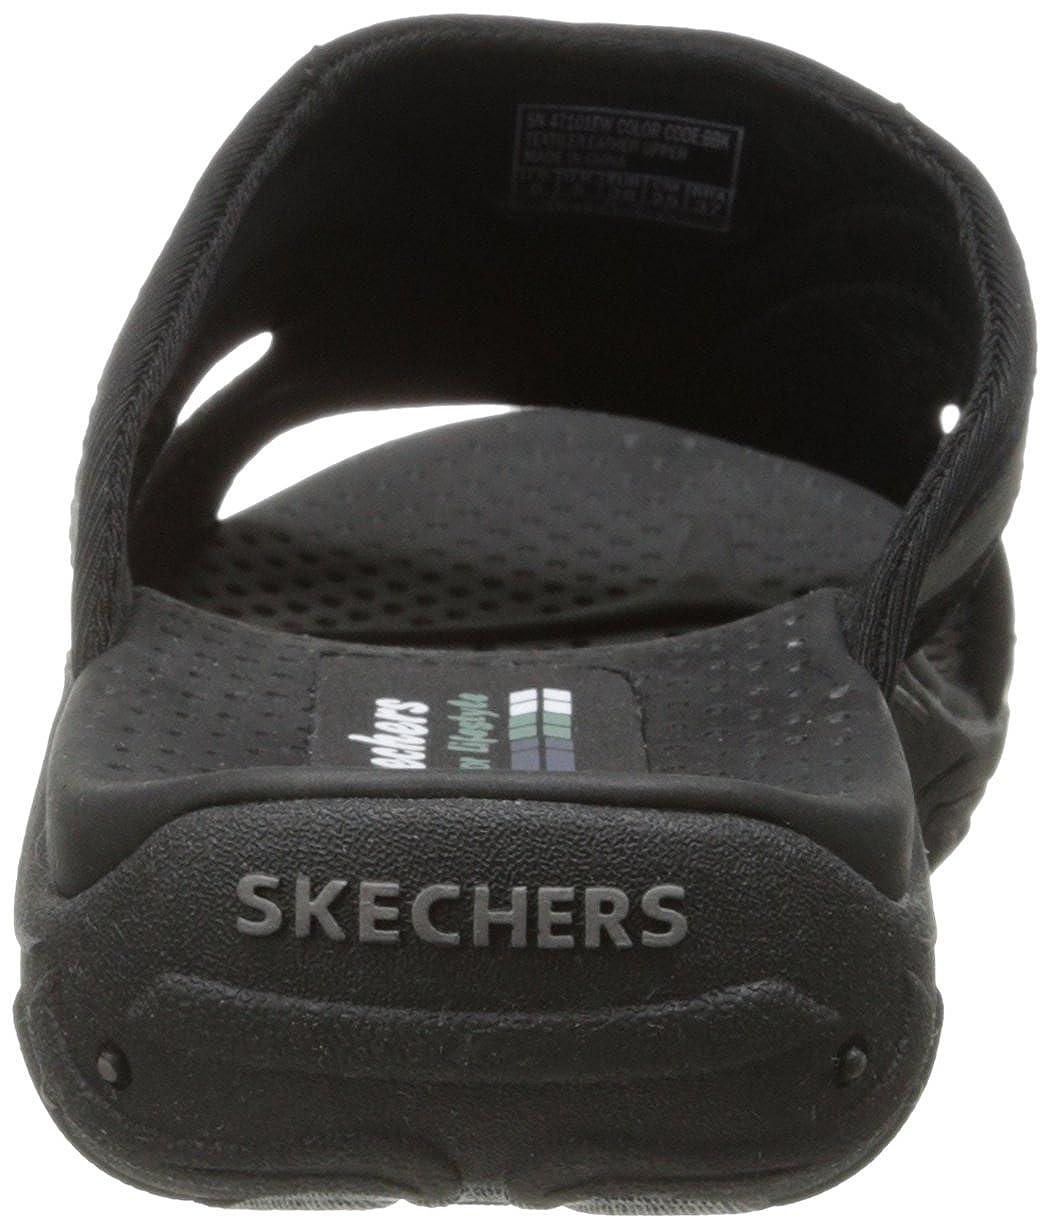 Skechers Reggae Slide, Sun Fest 47101 Damen Slide, Reggae Schwarz - schwarz - Größe: 42 1b05c4